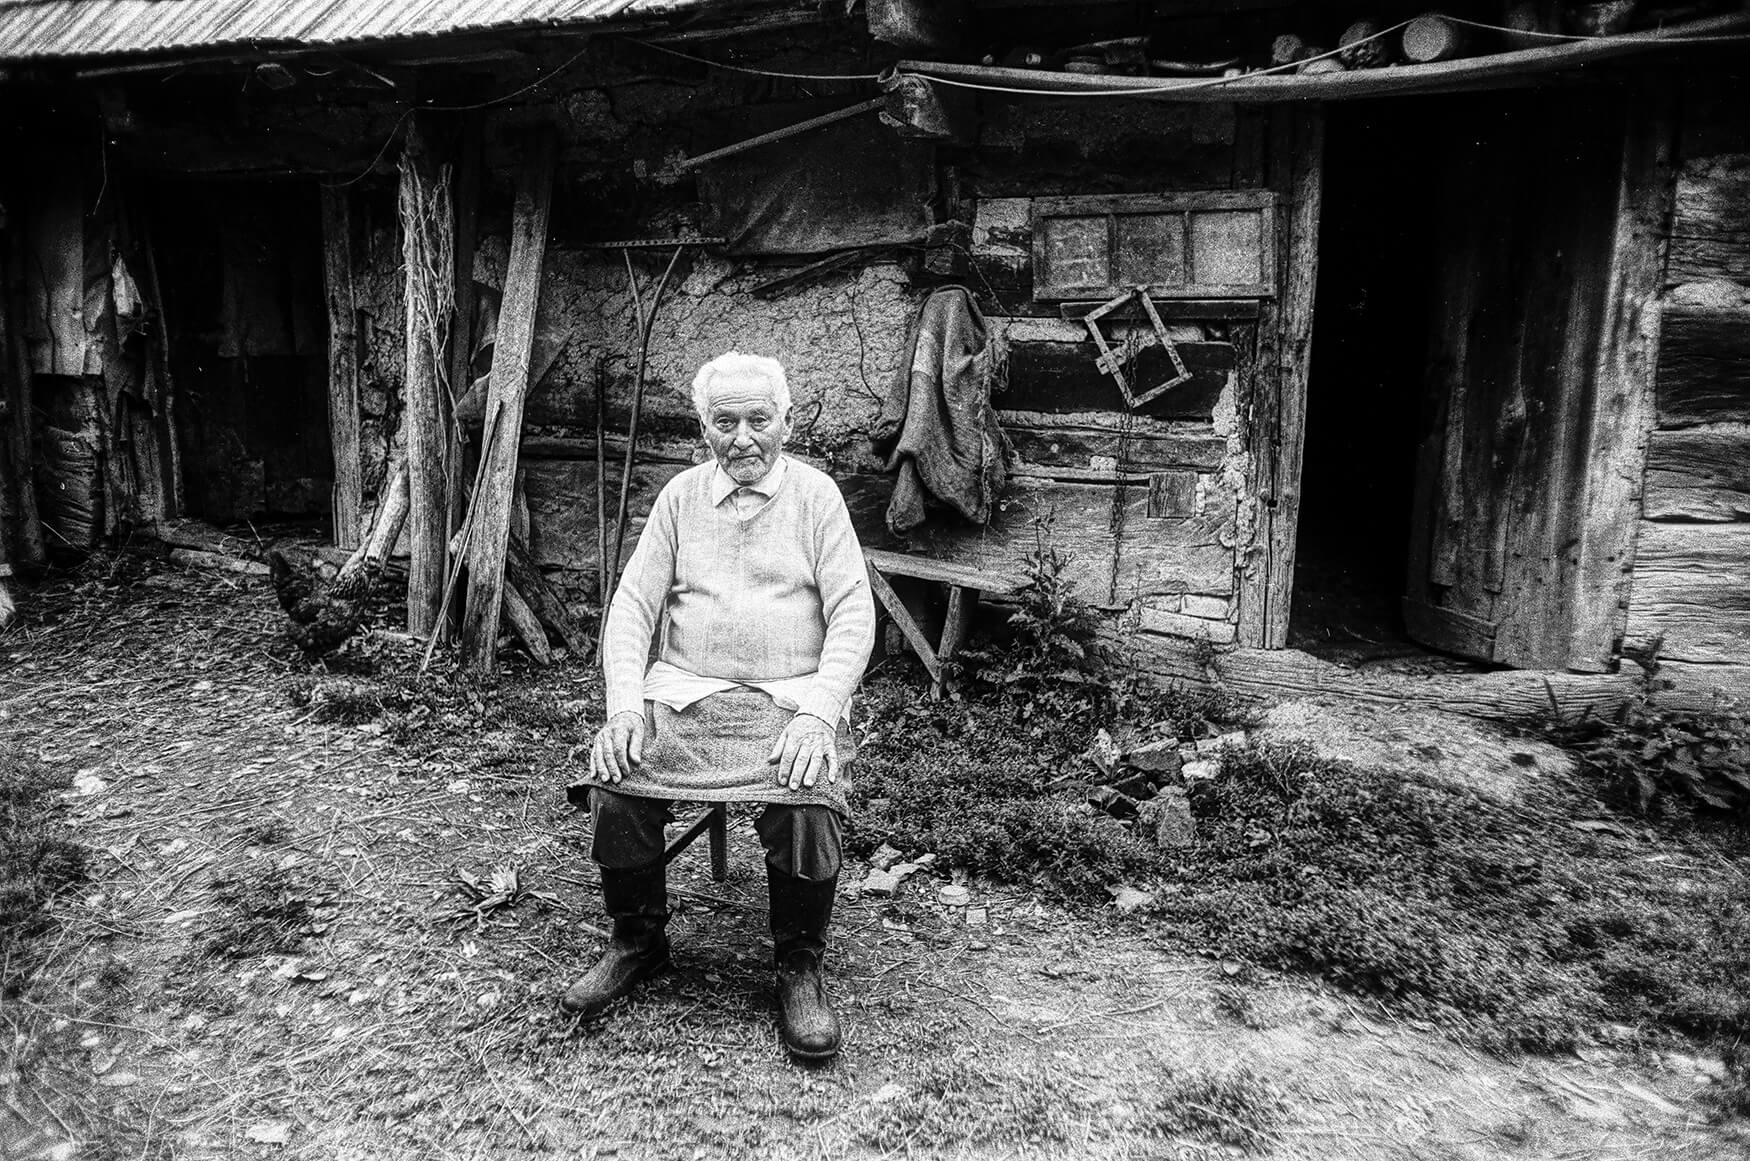 Autor:Nenad-Težak-Ostarjeli